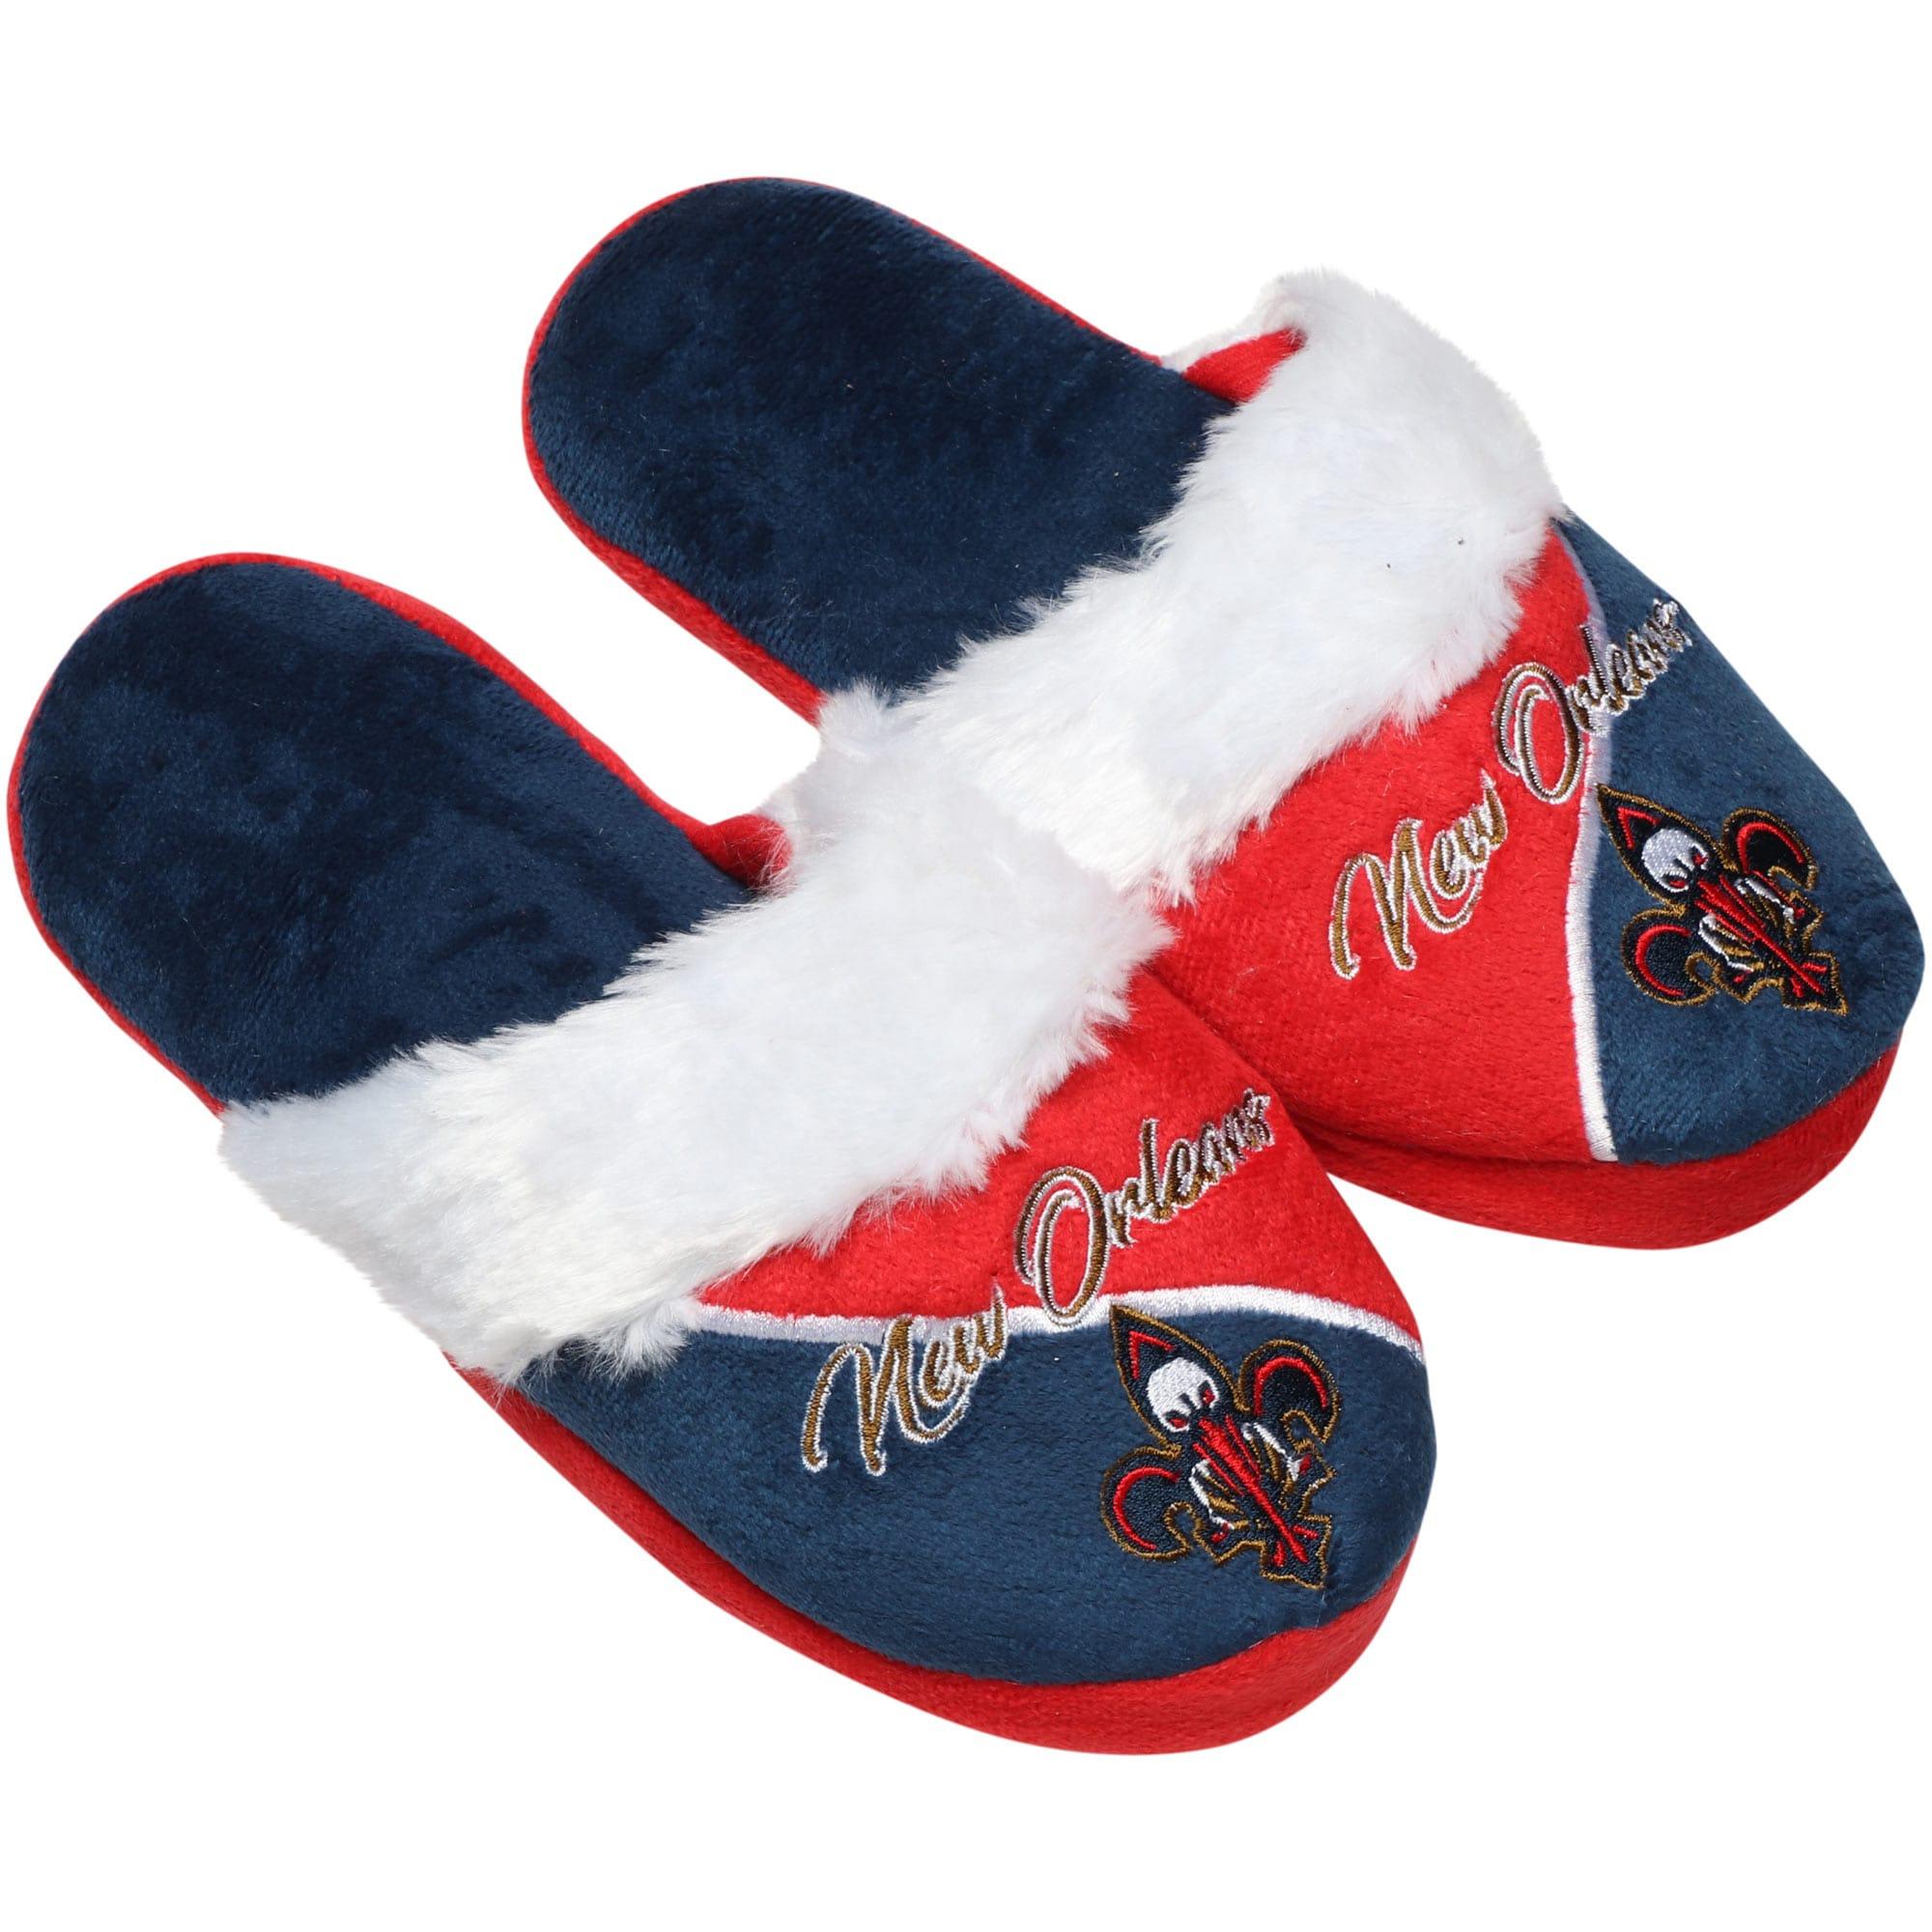 New Orleans Pelicans Women's Cursive Colorblock Slippers